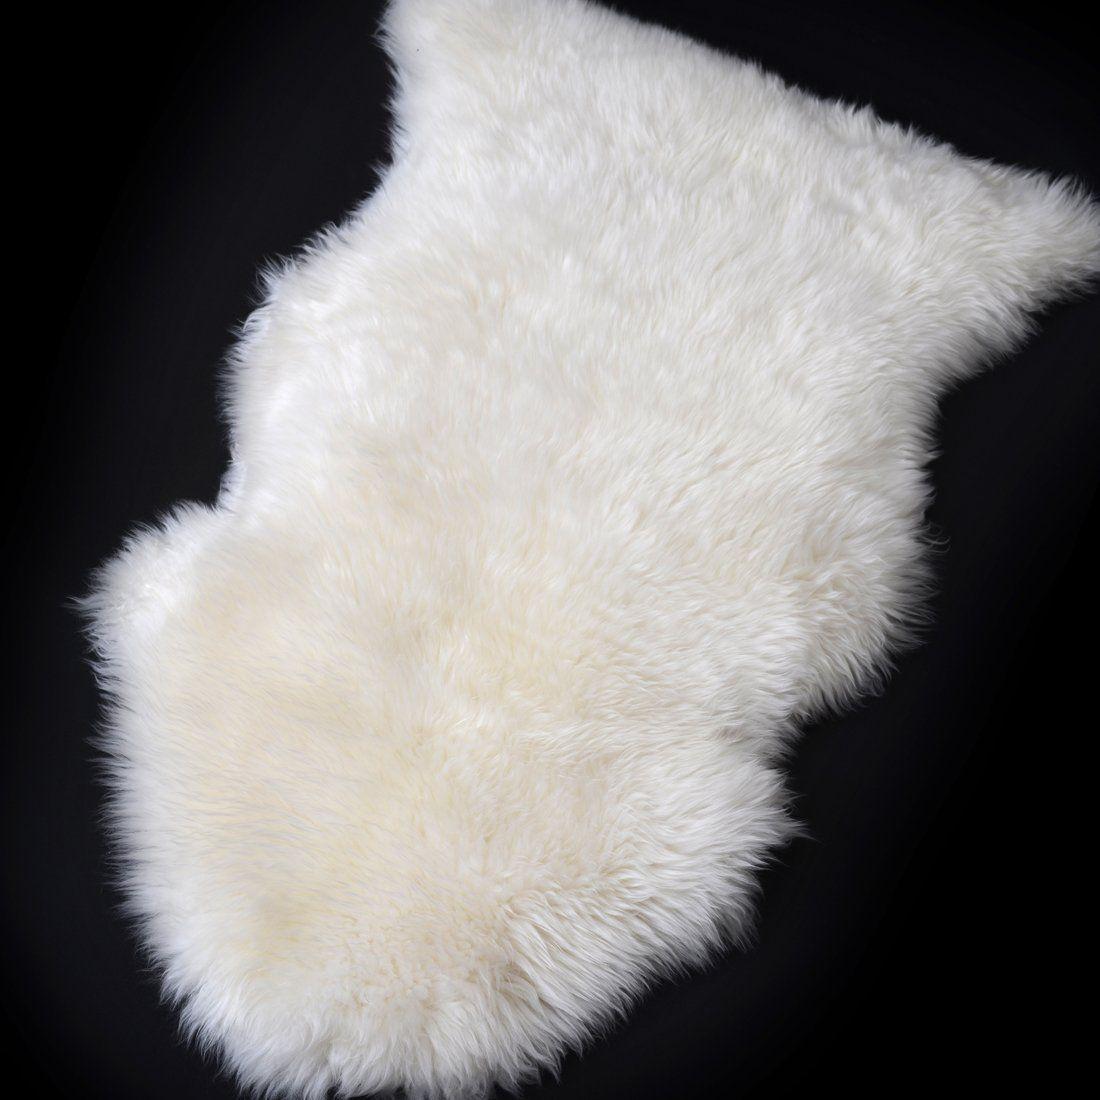 Sheepskin White Fur Rug Single Pelt 2 X 3 White Fur Rug White Sheepskin Rug Fur Rug